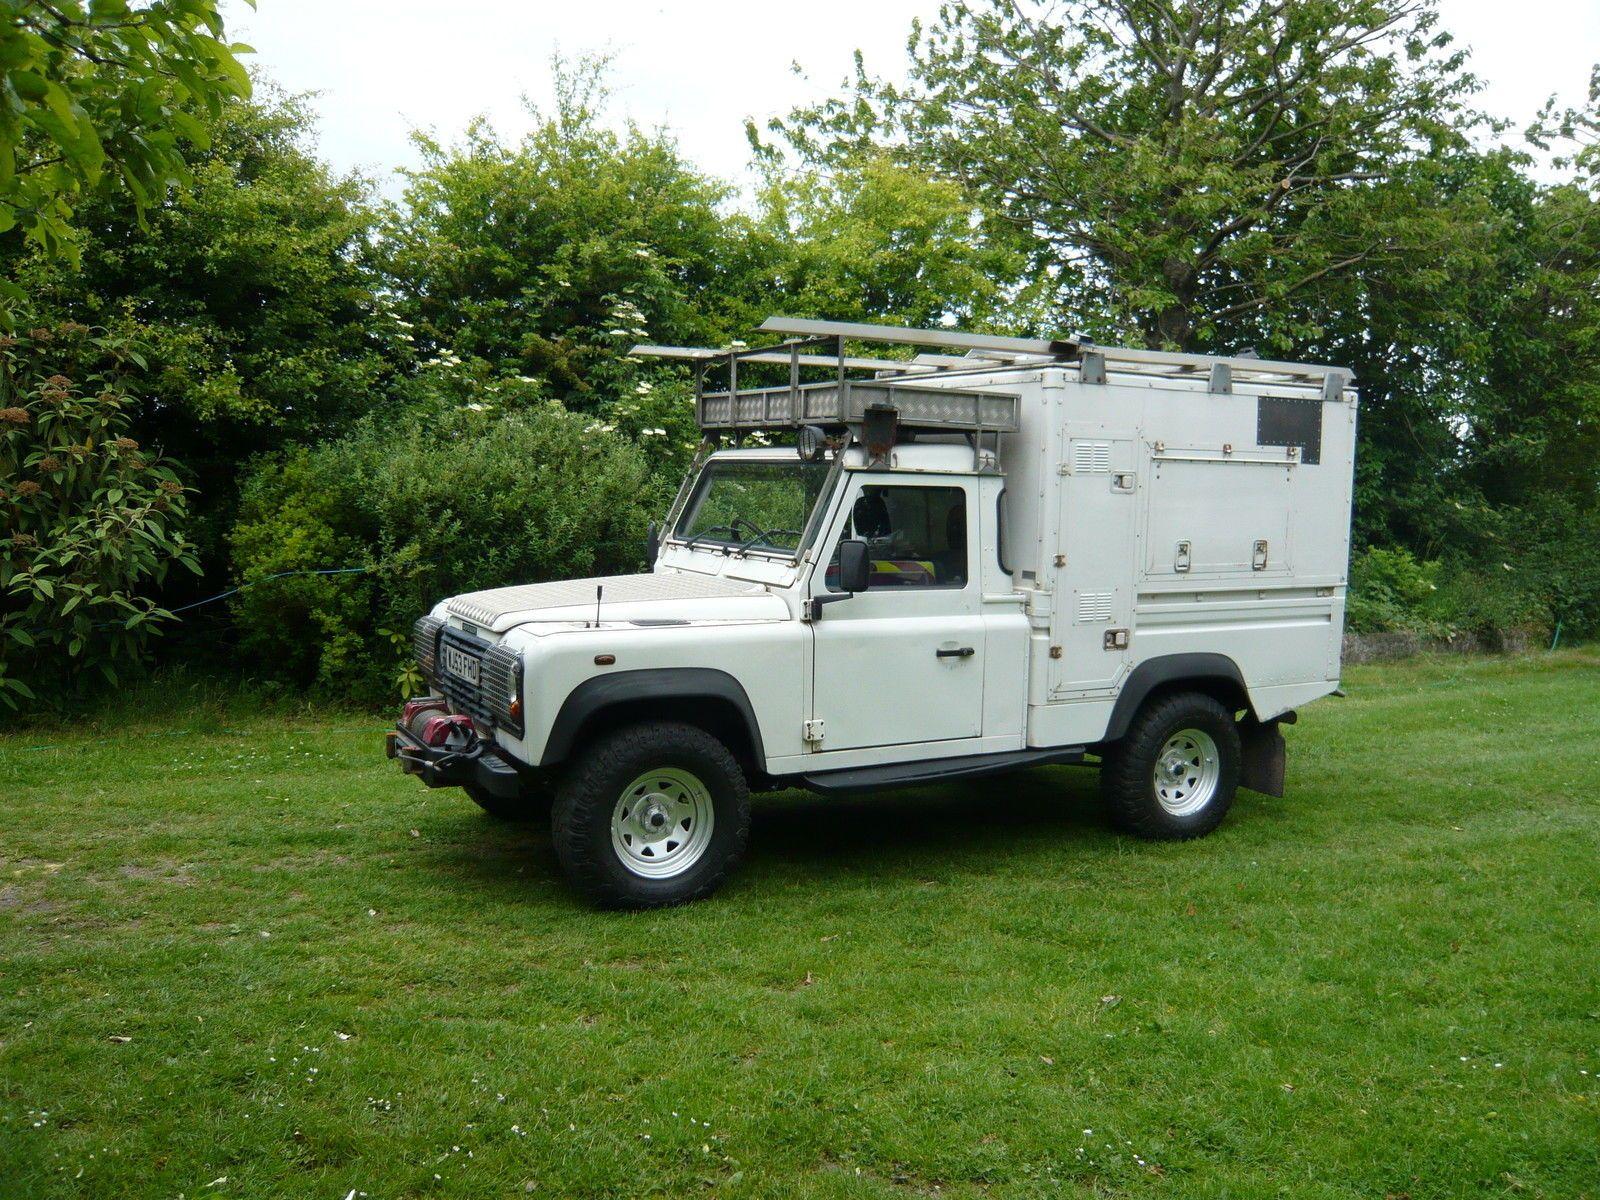 Land Rover Santana 109 landrover santana 109 defender safari